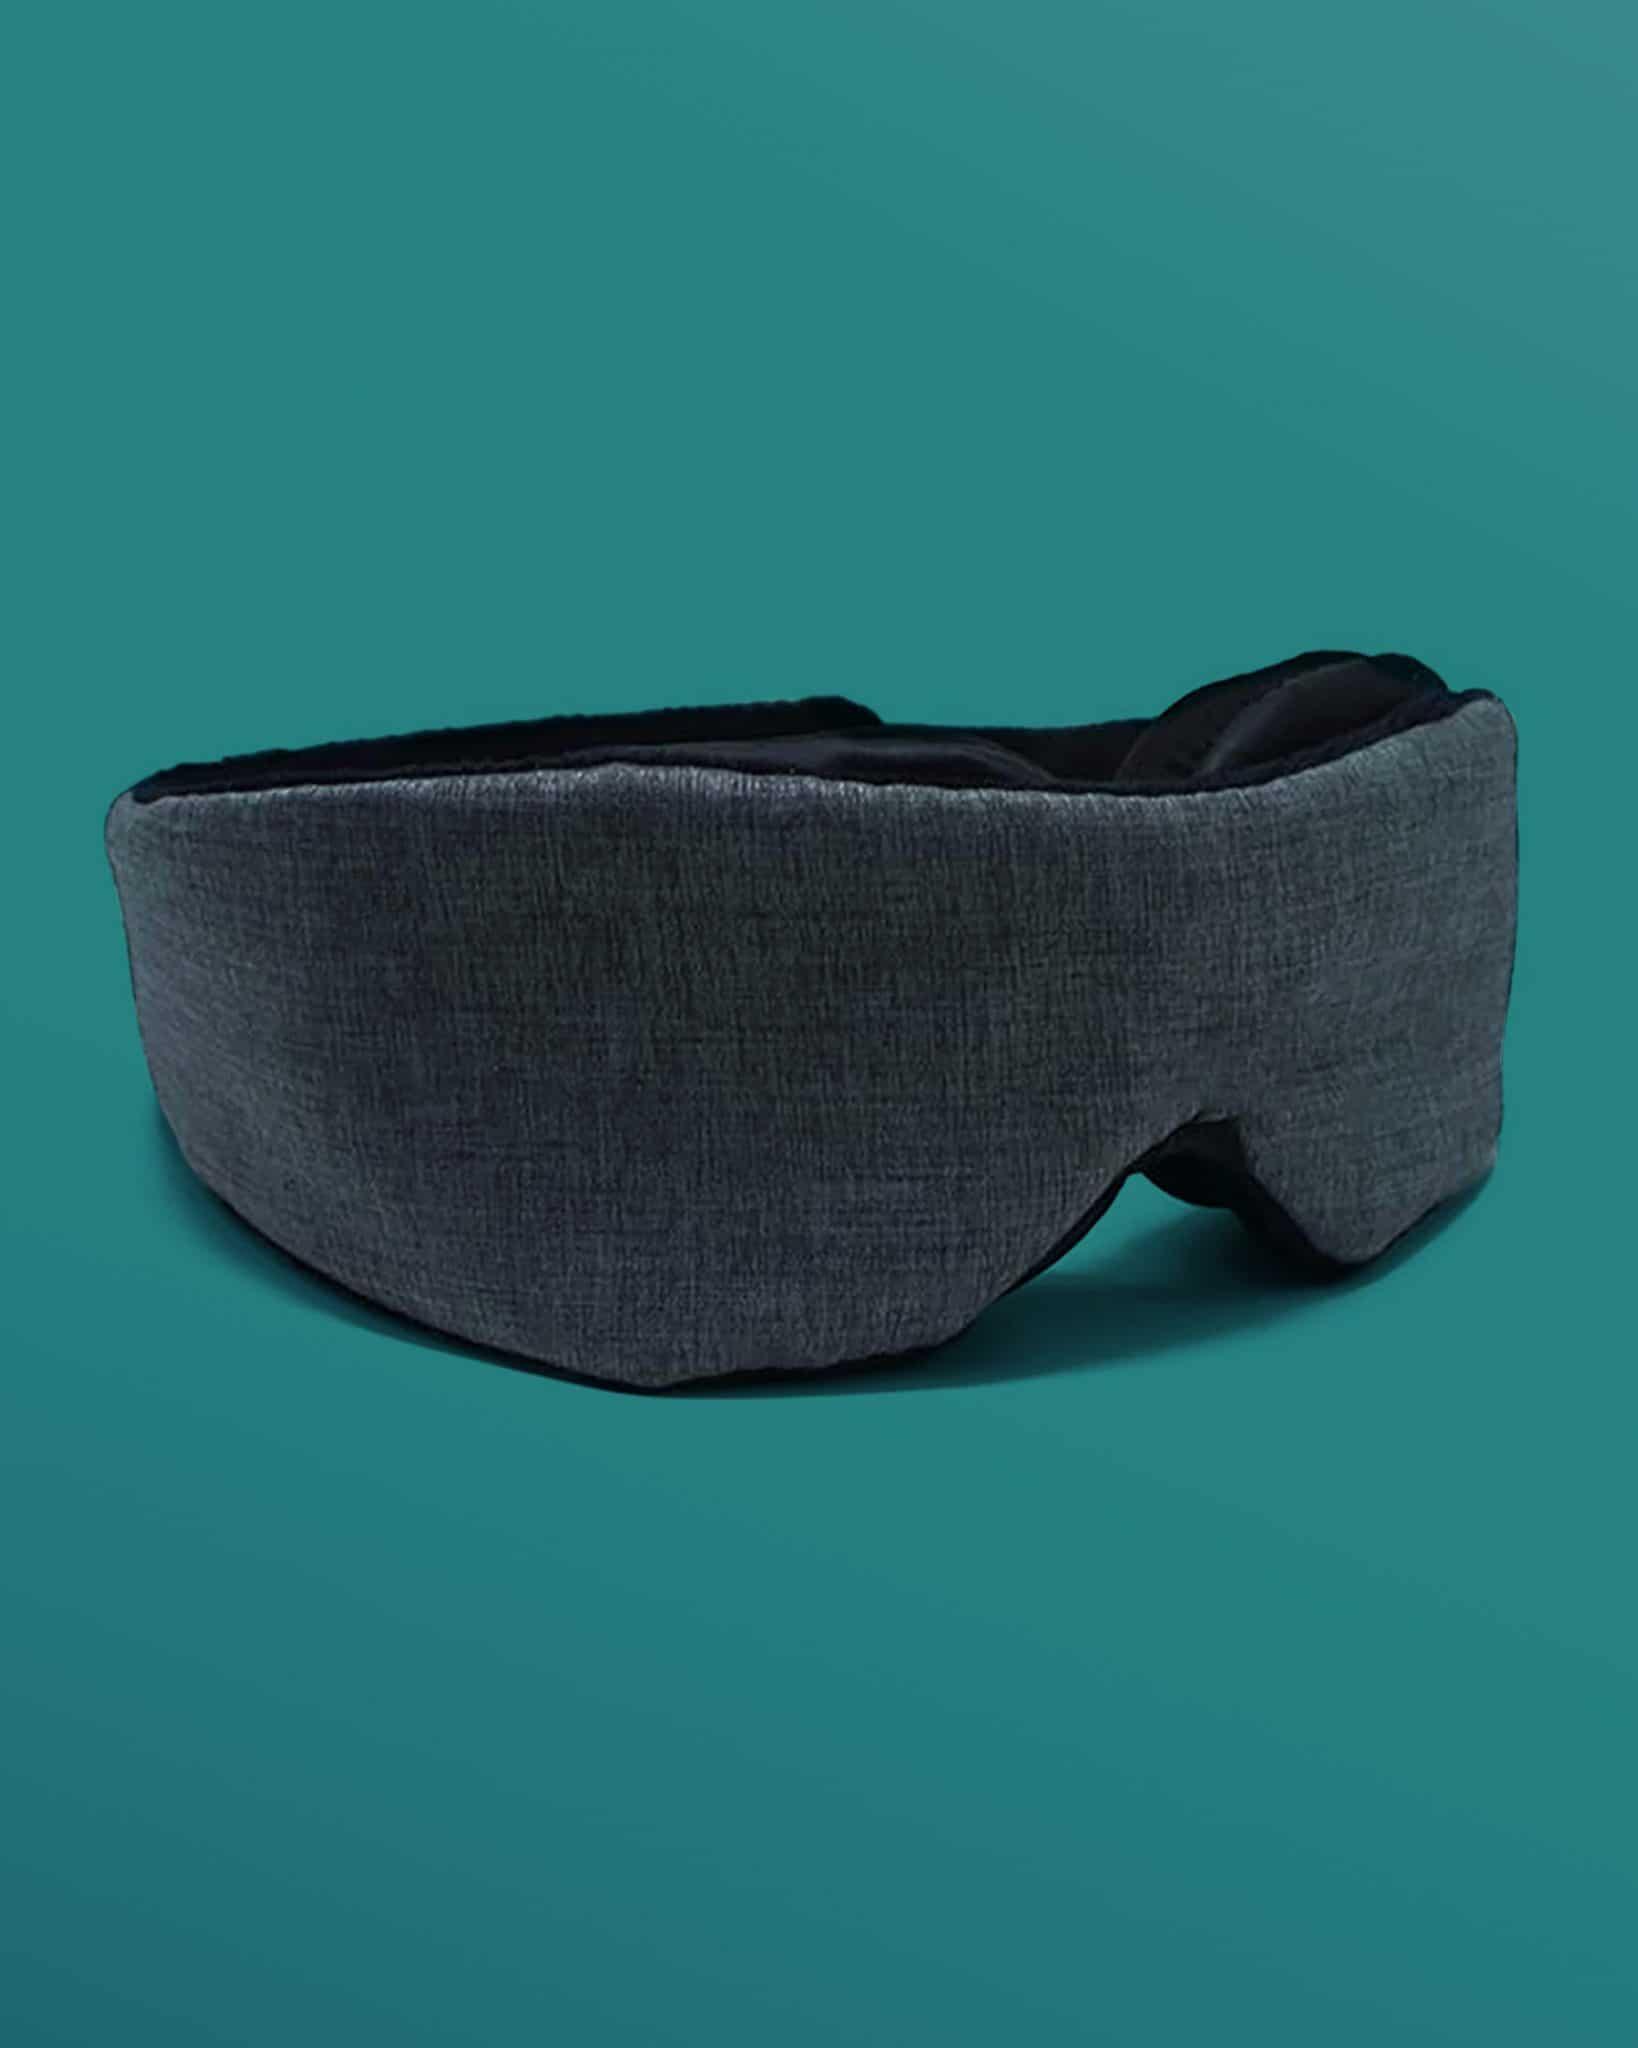 Kally 3D Eye Mask